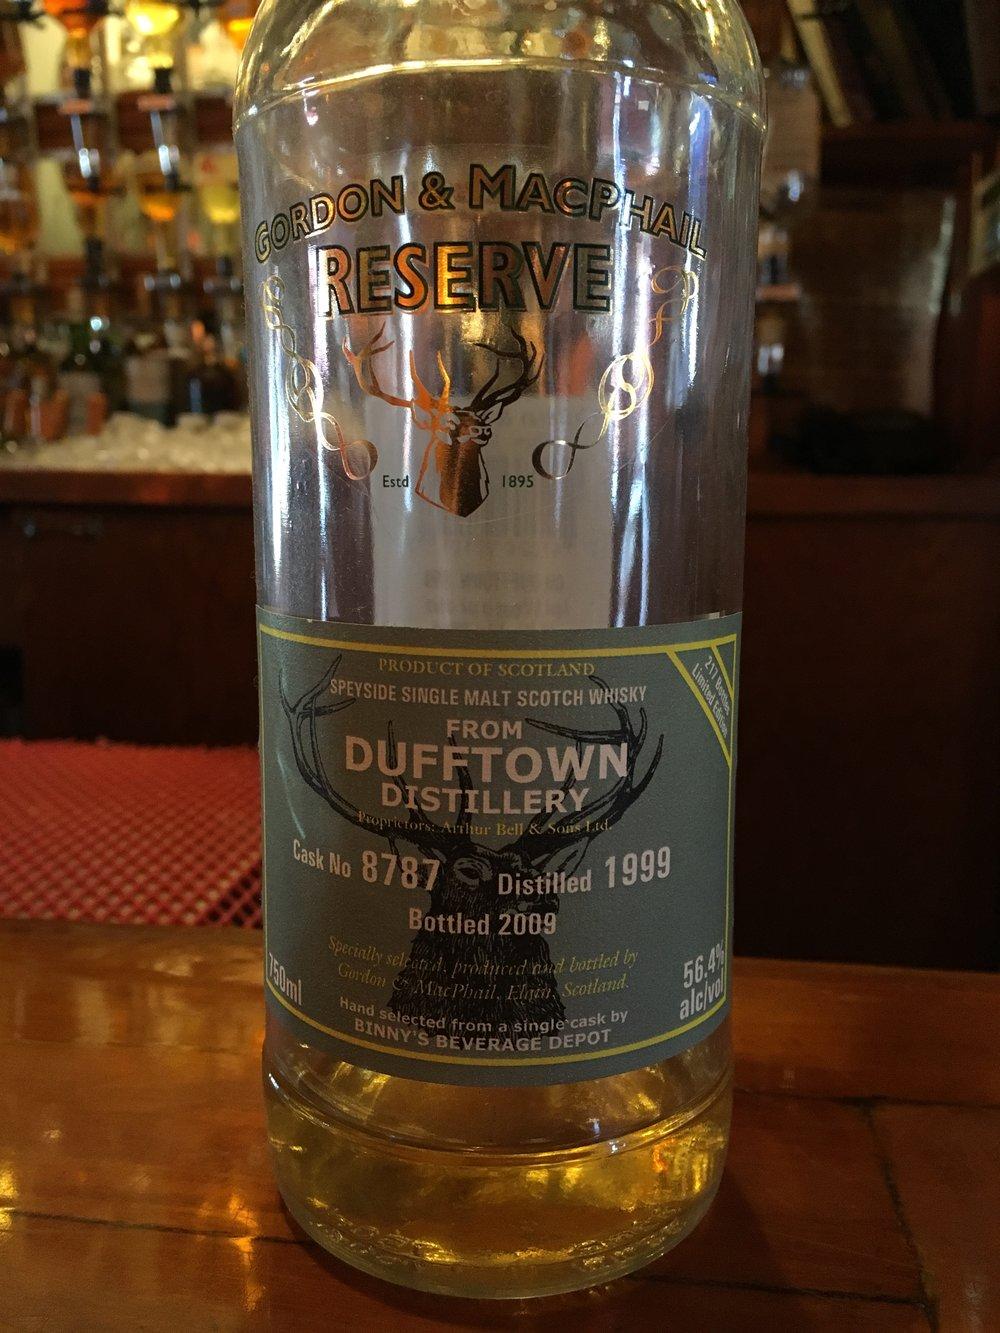 9 Year Old | 56.4% ABV - Distillery | Dufftown